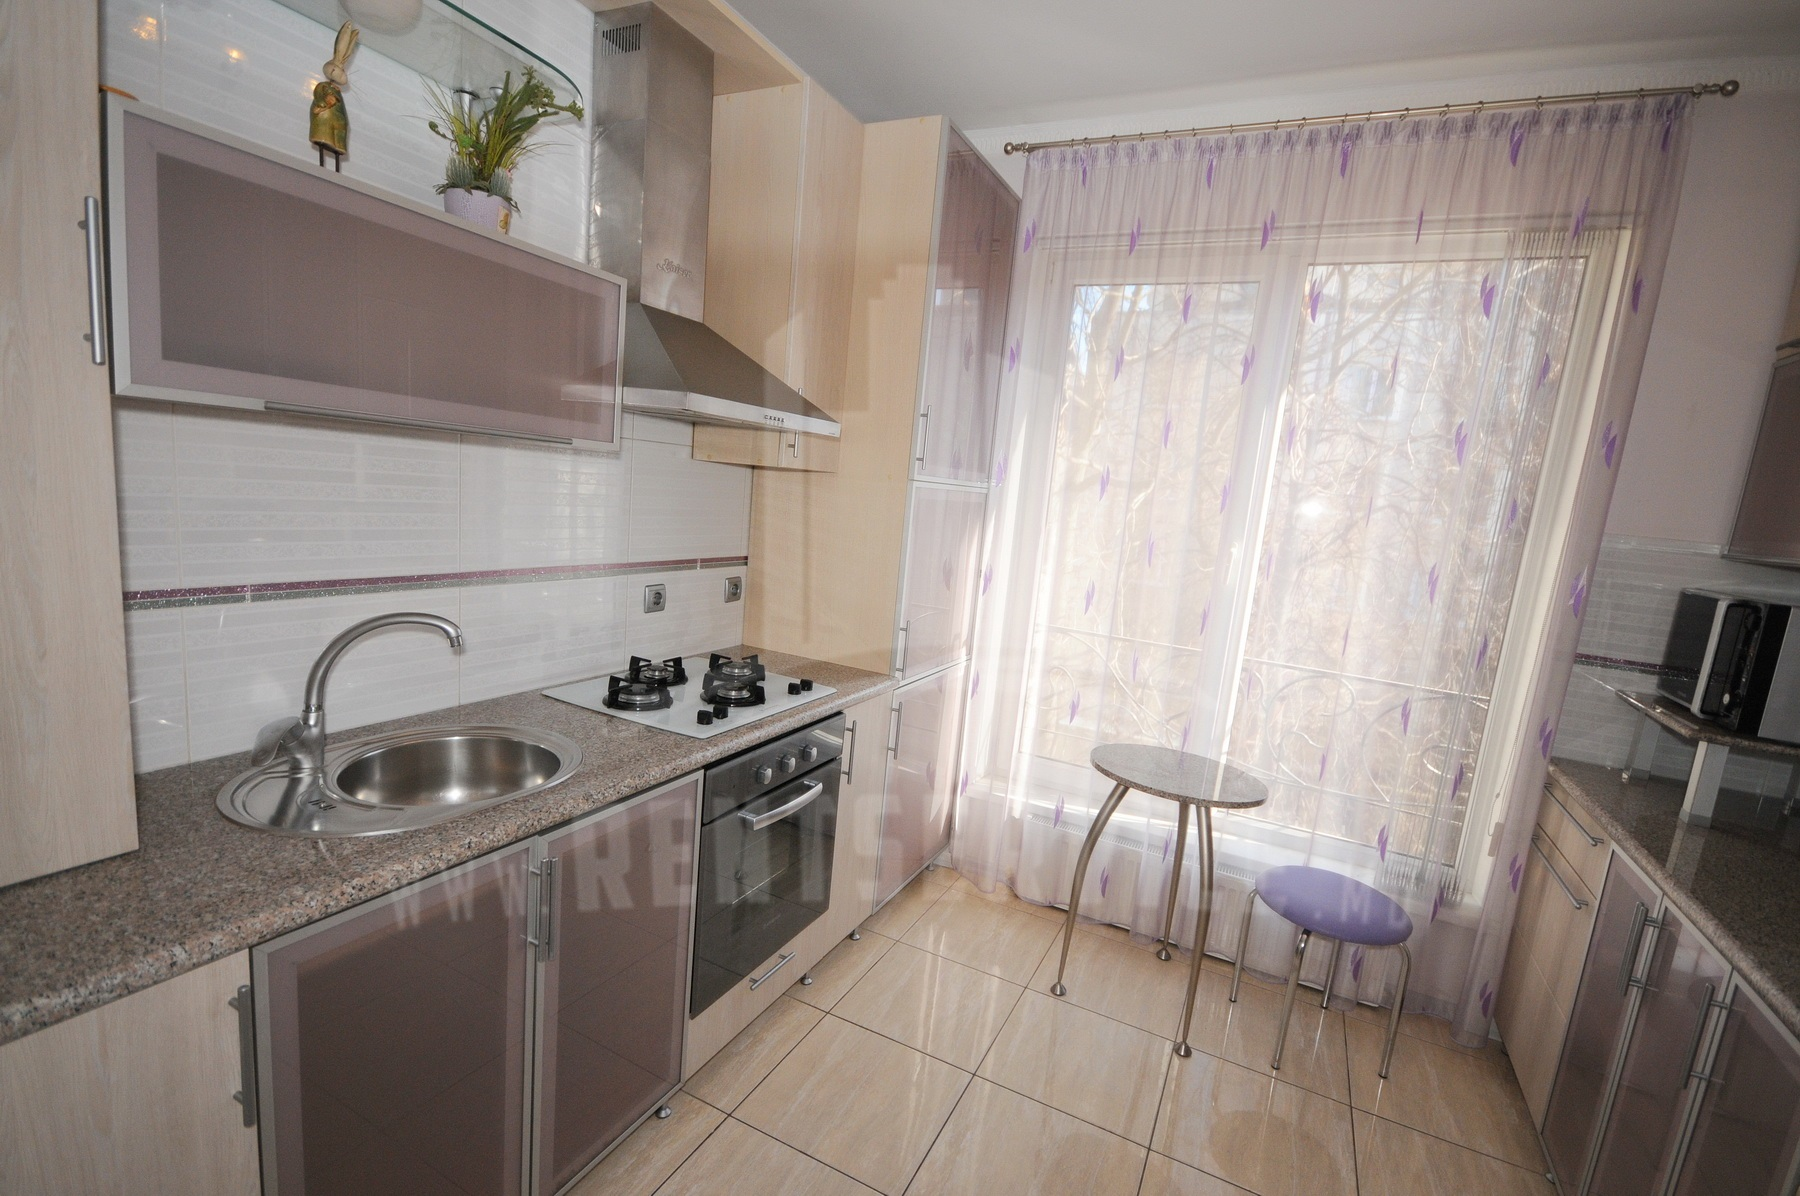 210_apartment_6.JPG